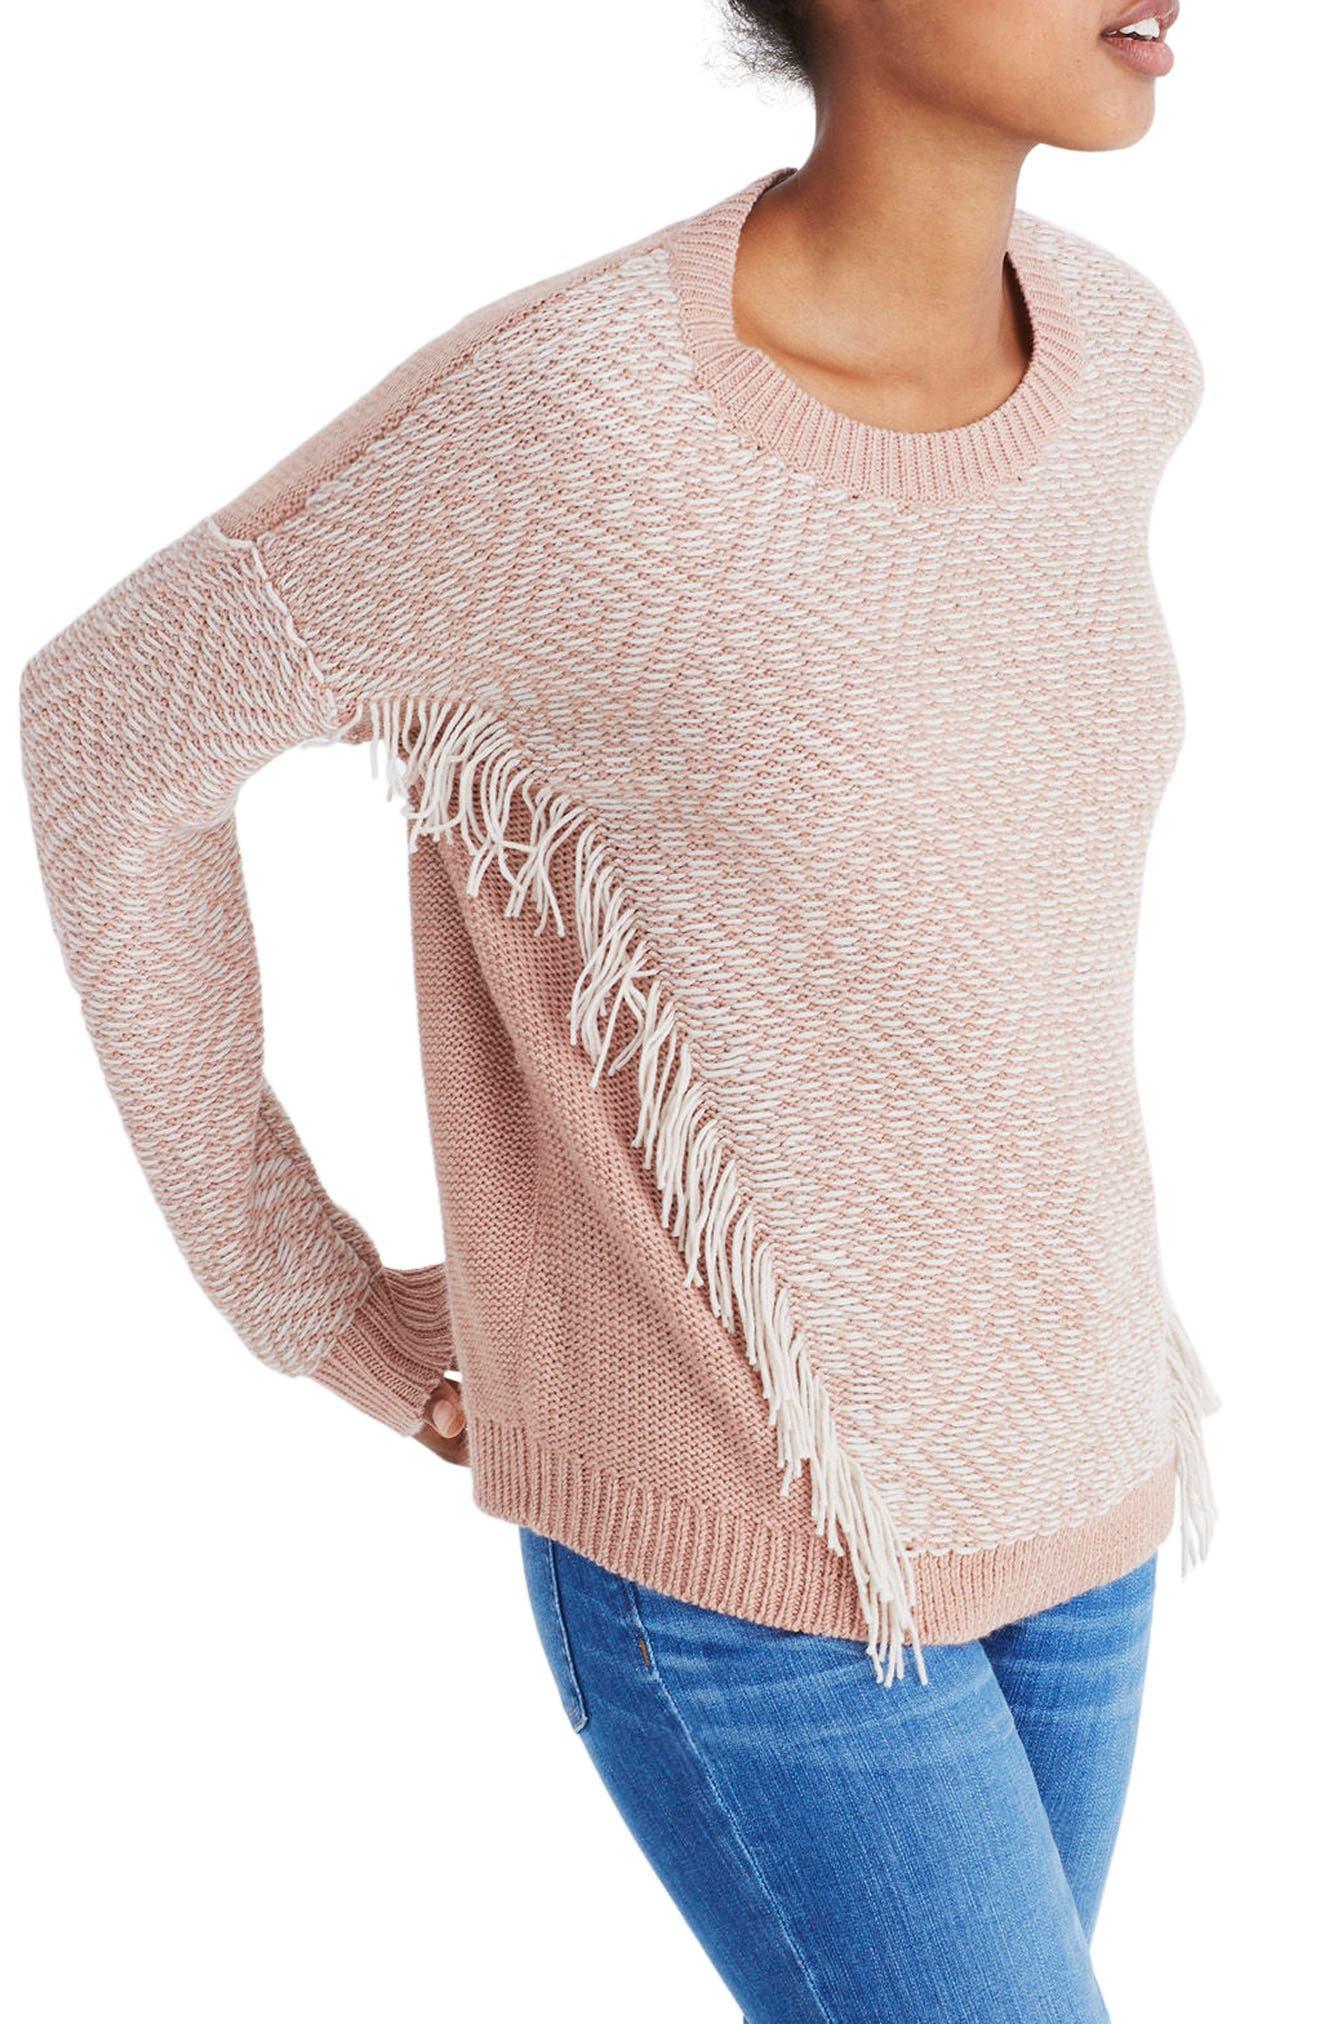 Reverse Diamond Pullover Sweater,                             Alternate thumbnail 3, color,                             250